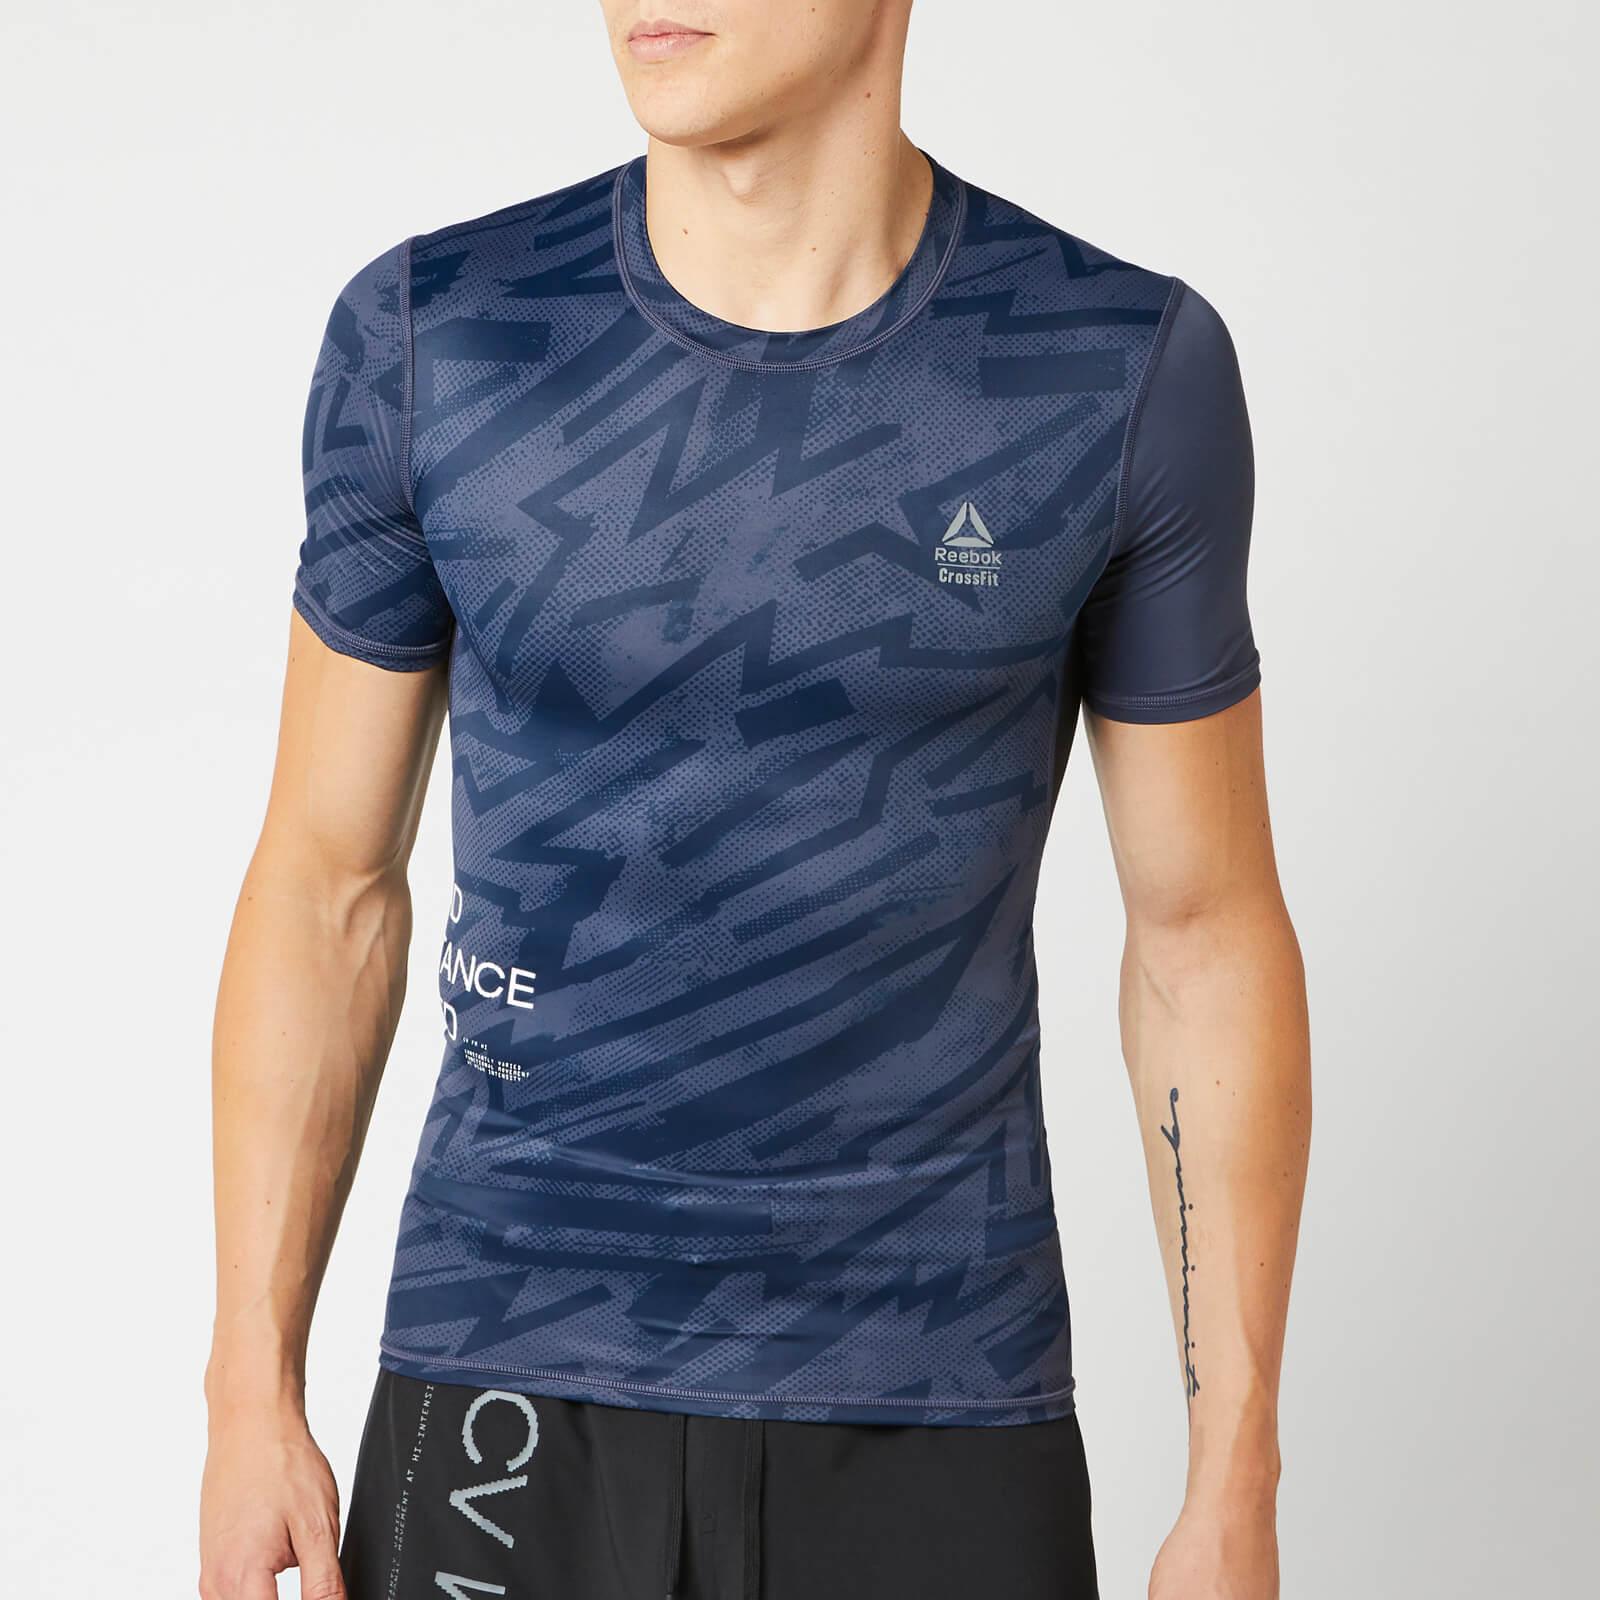 Reebok Men's CrossFit Comp Short Sleeve T-Shirt - Blue - XXL - Blue